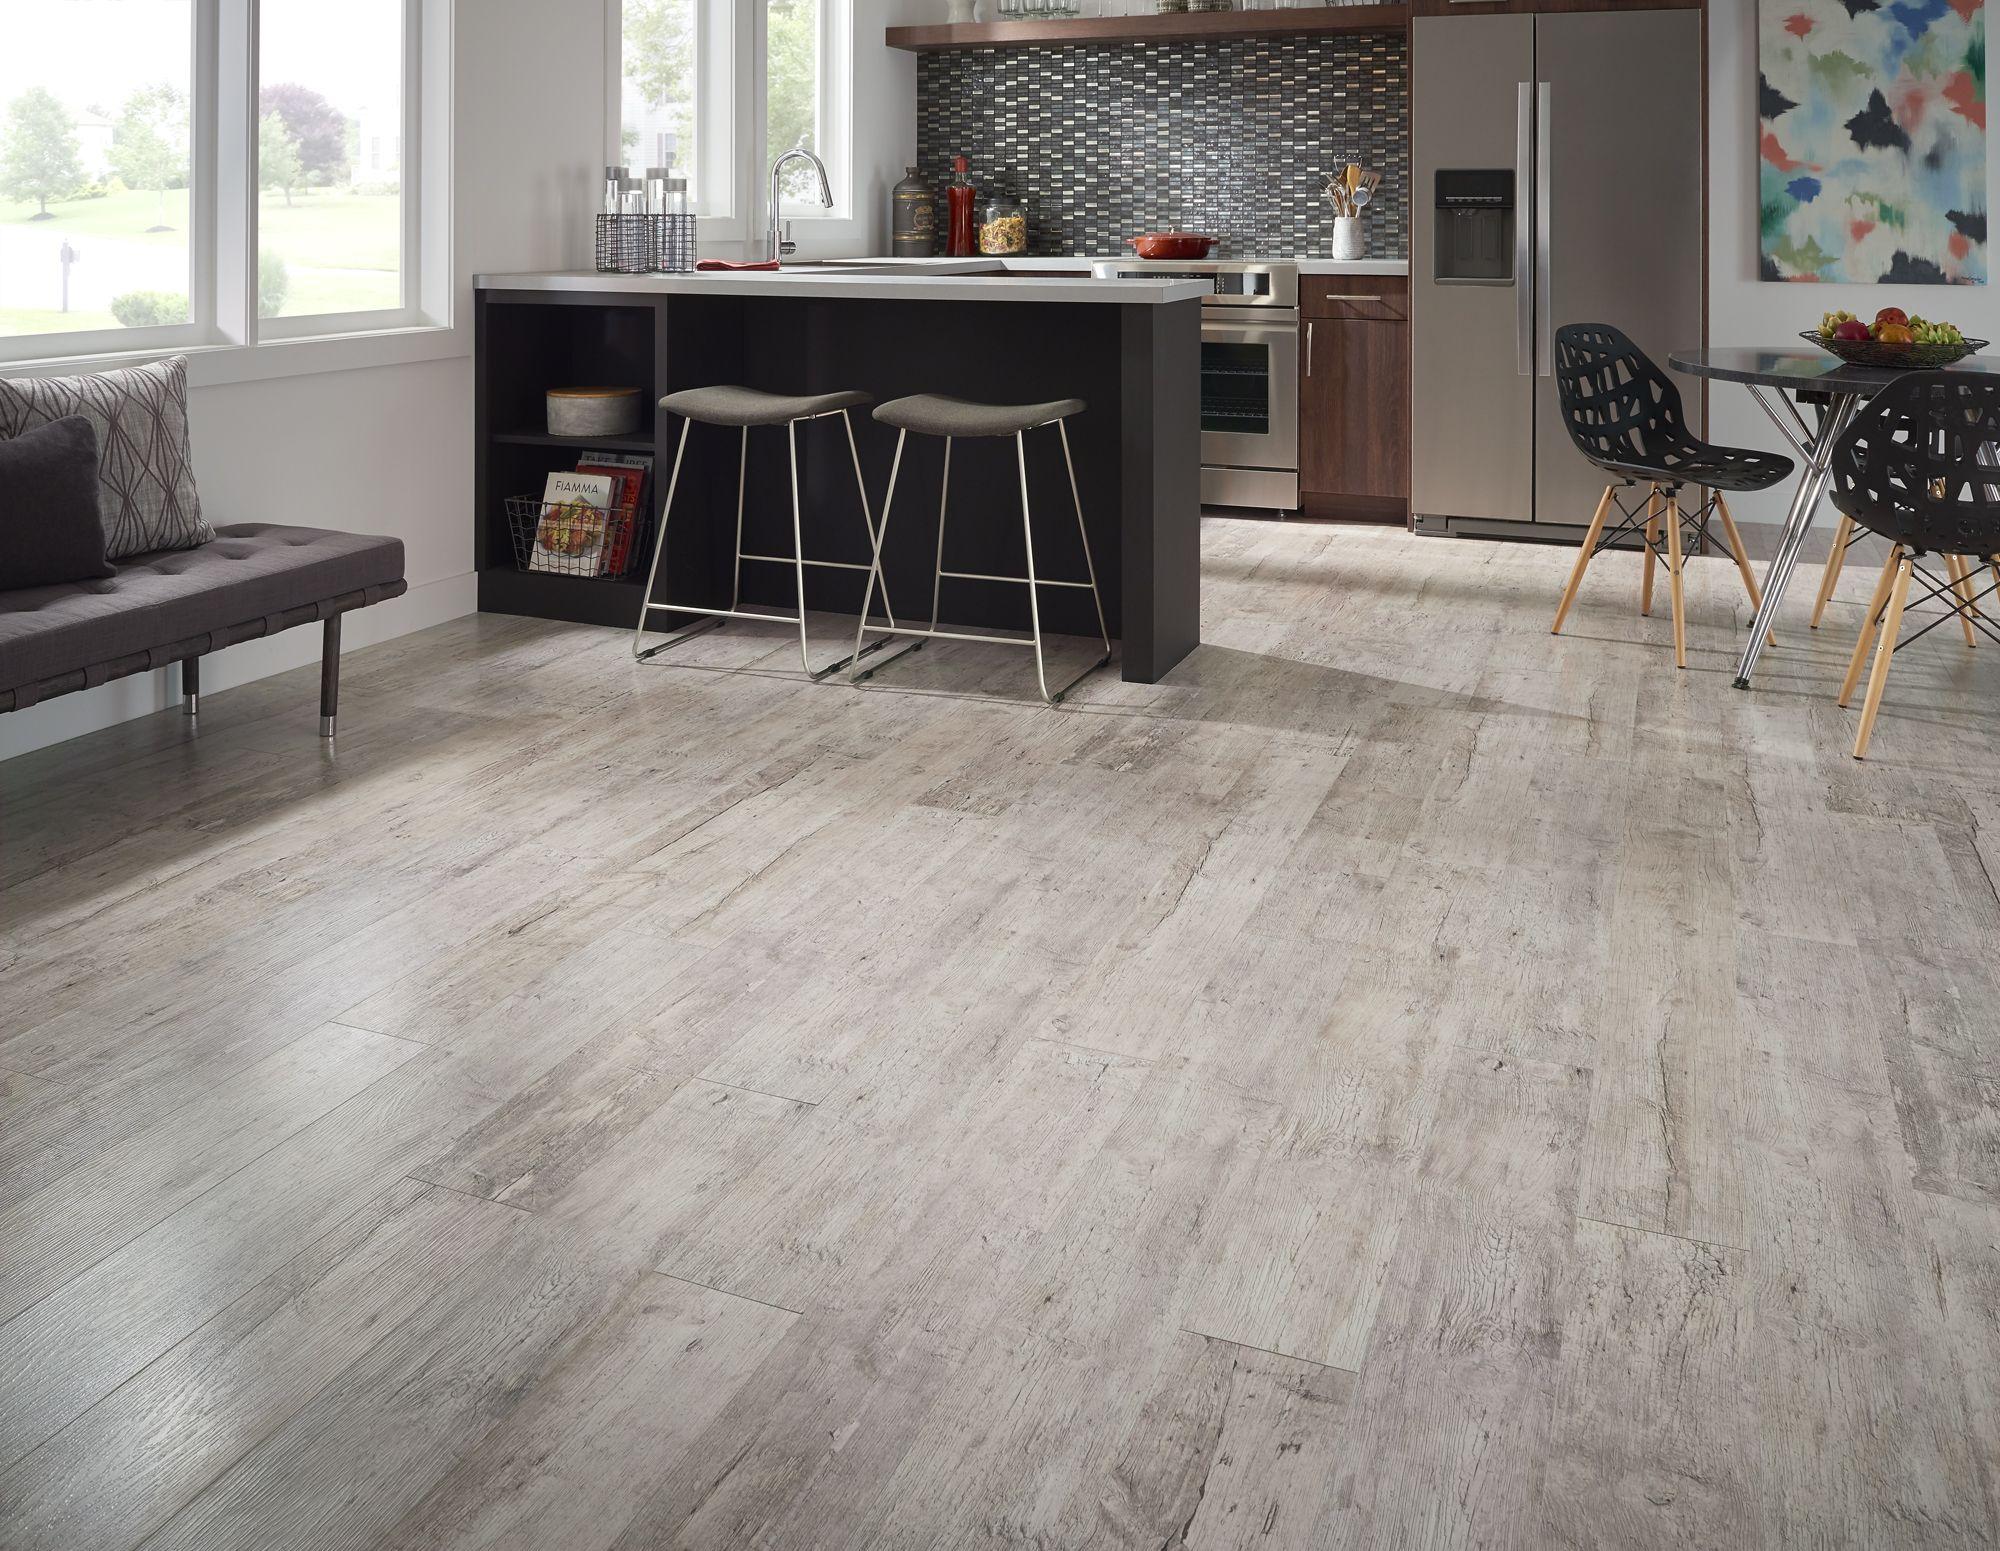 Lumber Liquidators' Click Ceramic Plank Tile Flooring is Durable and ...